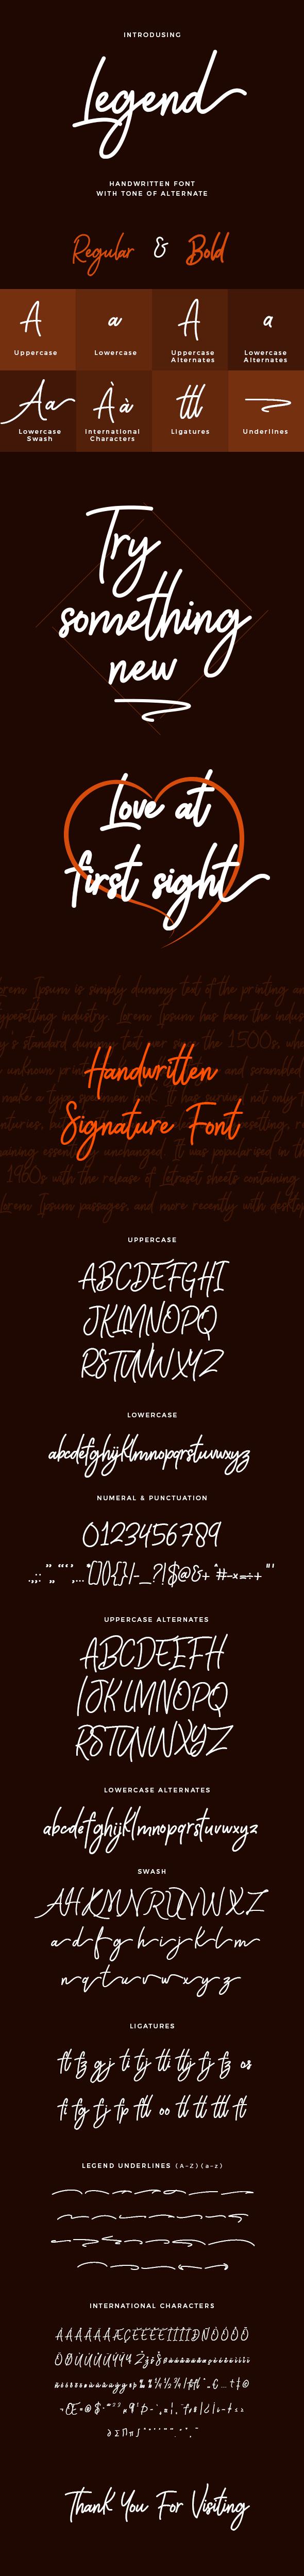 GraphicRiver Legend Handwritten Font 20391313